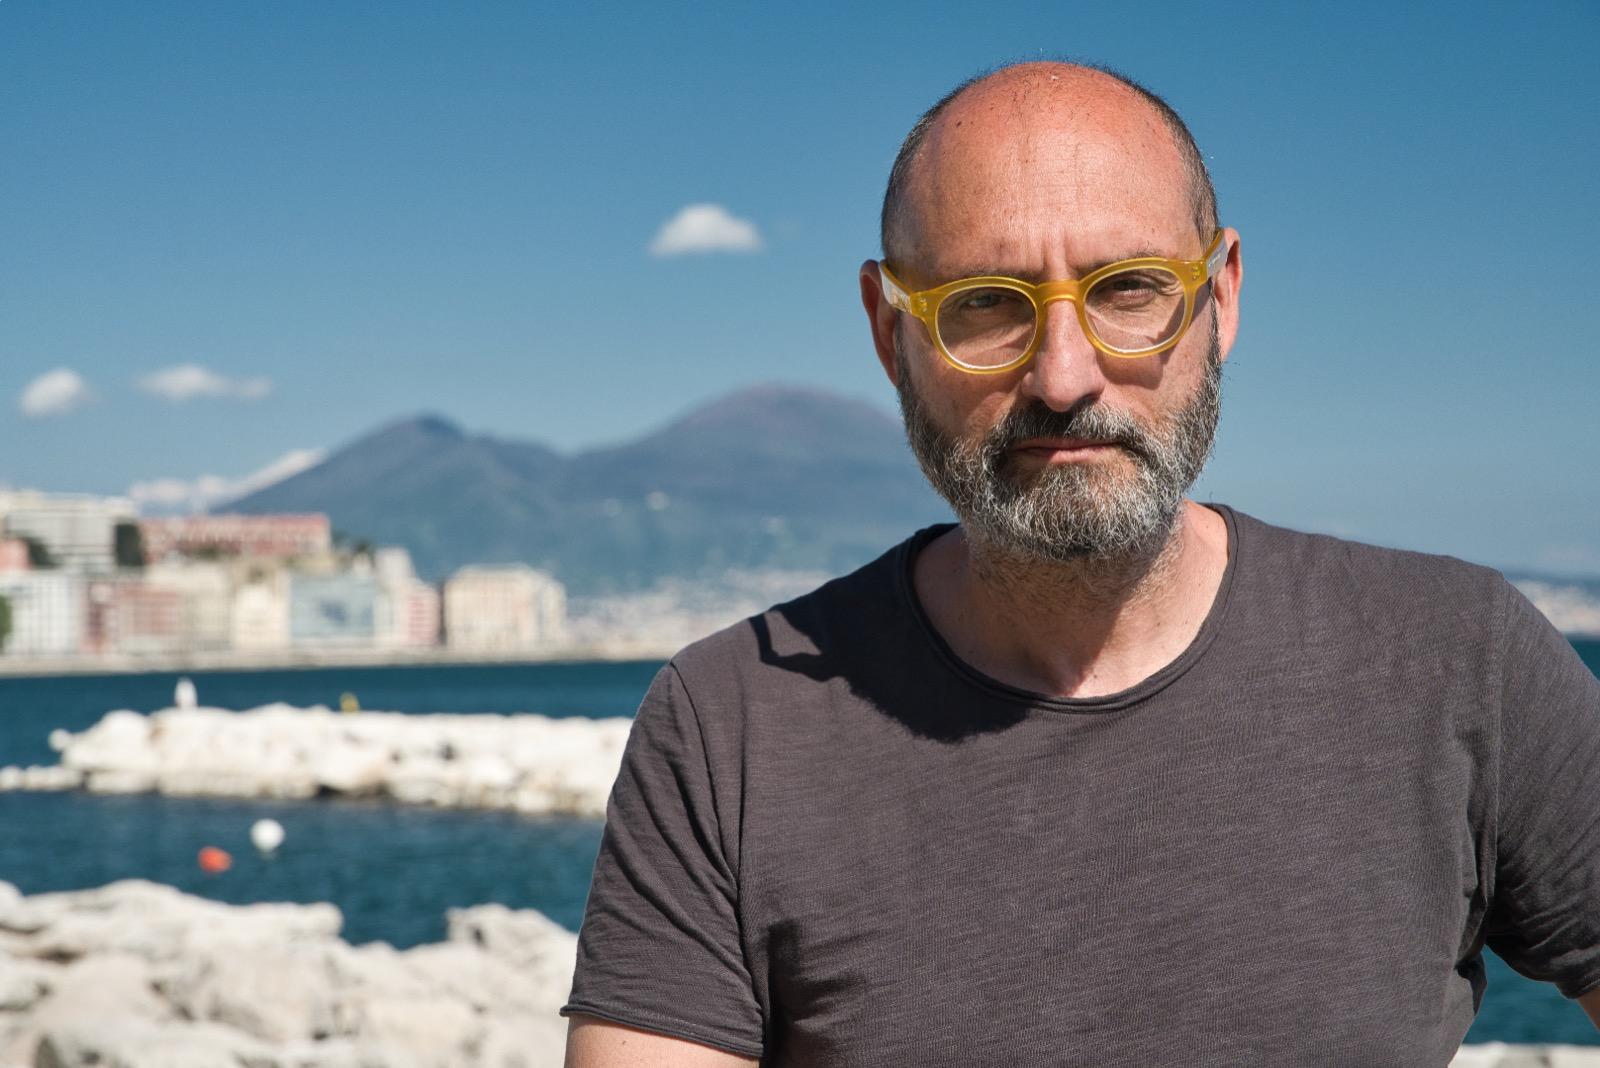 Mario Biglietto, © Gianfranco De Biasi